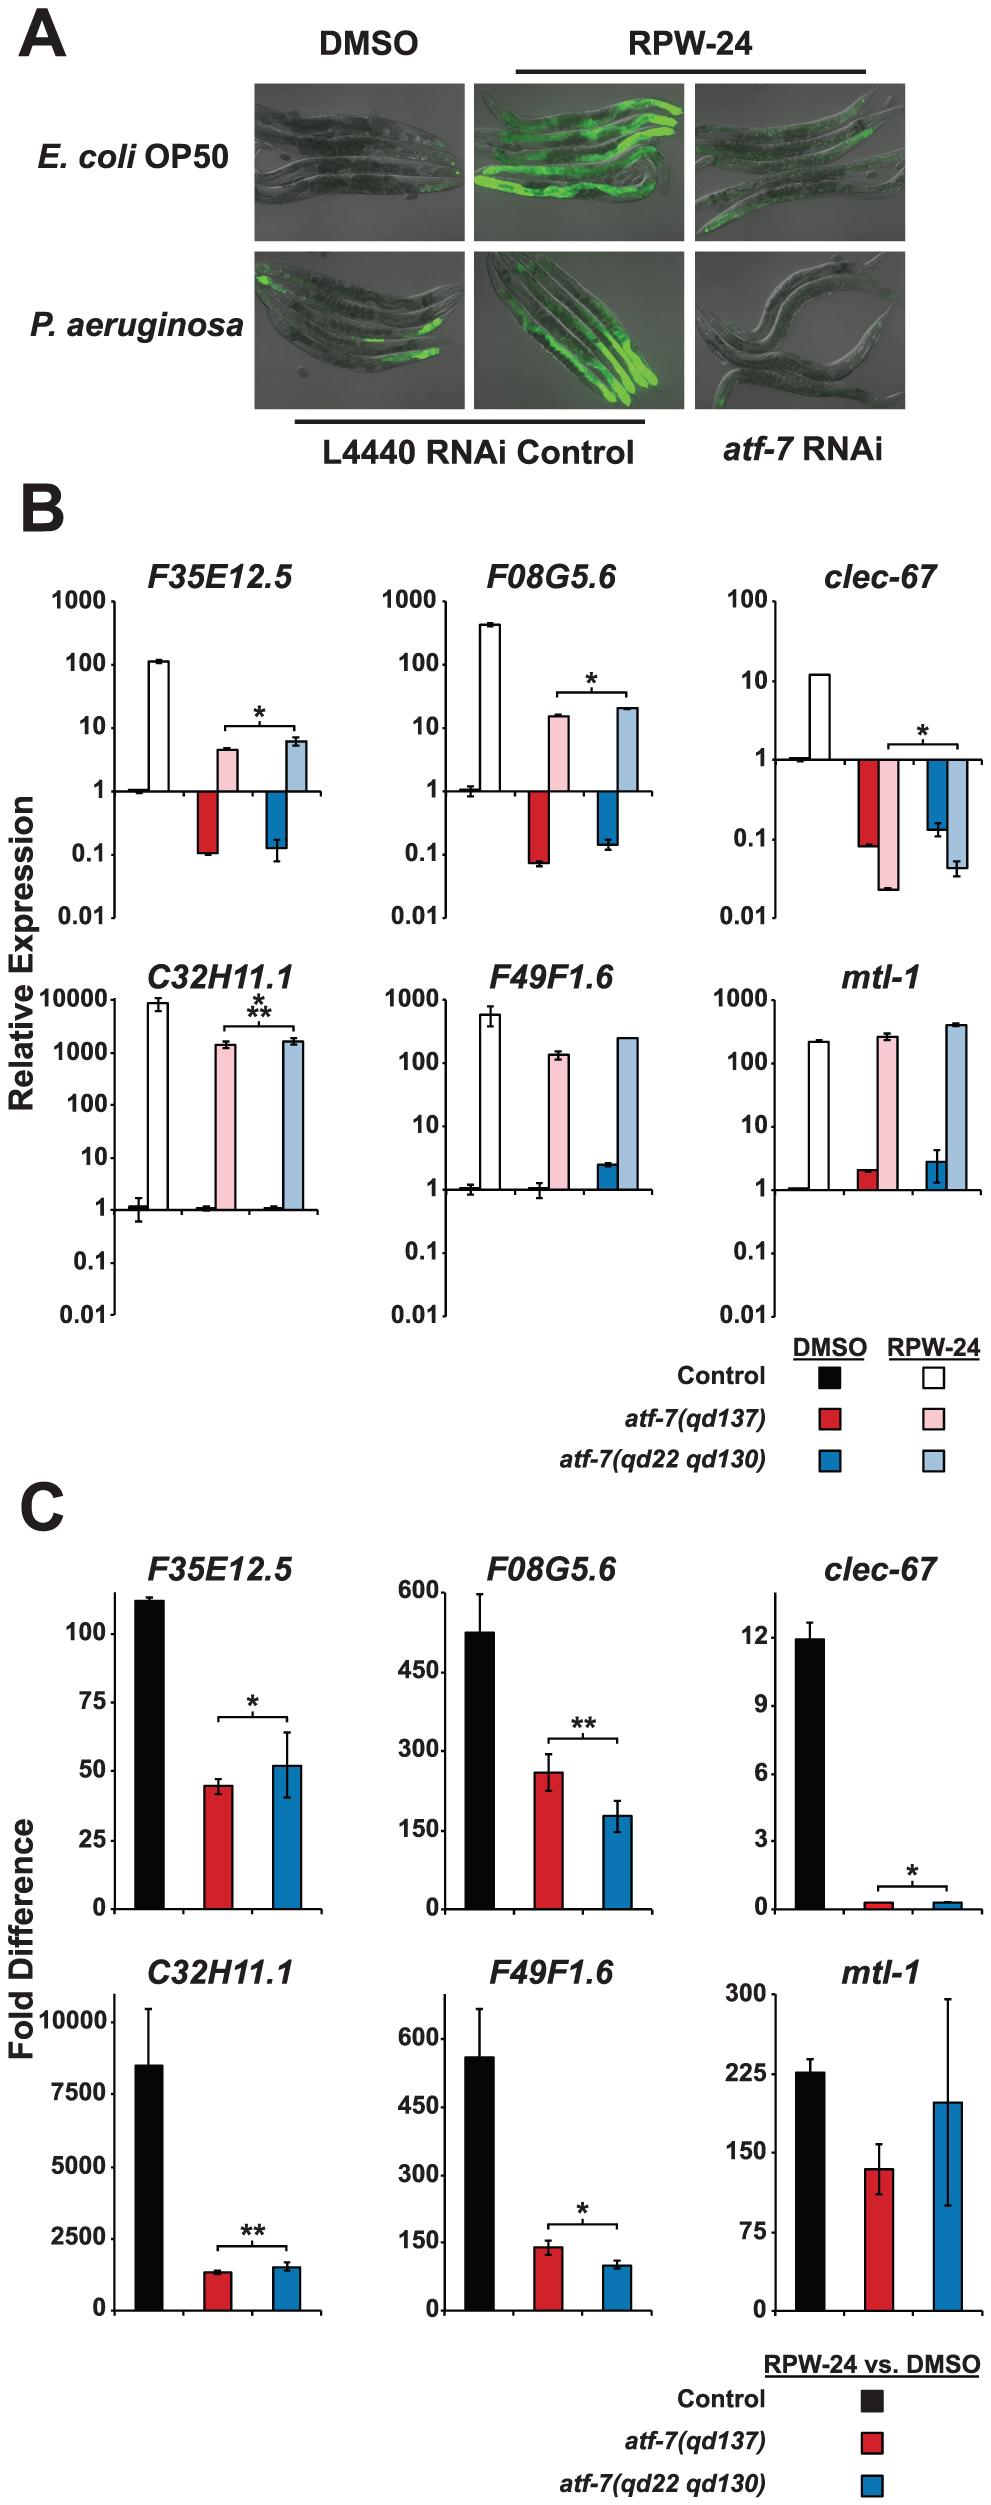 The <i>C. elegans</i> transcription factor ATF-7 regulates immune gene induction by RPW-24.